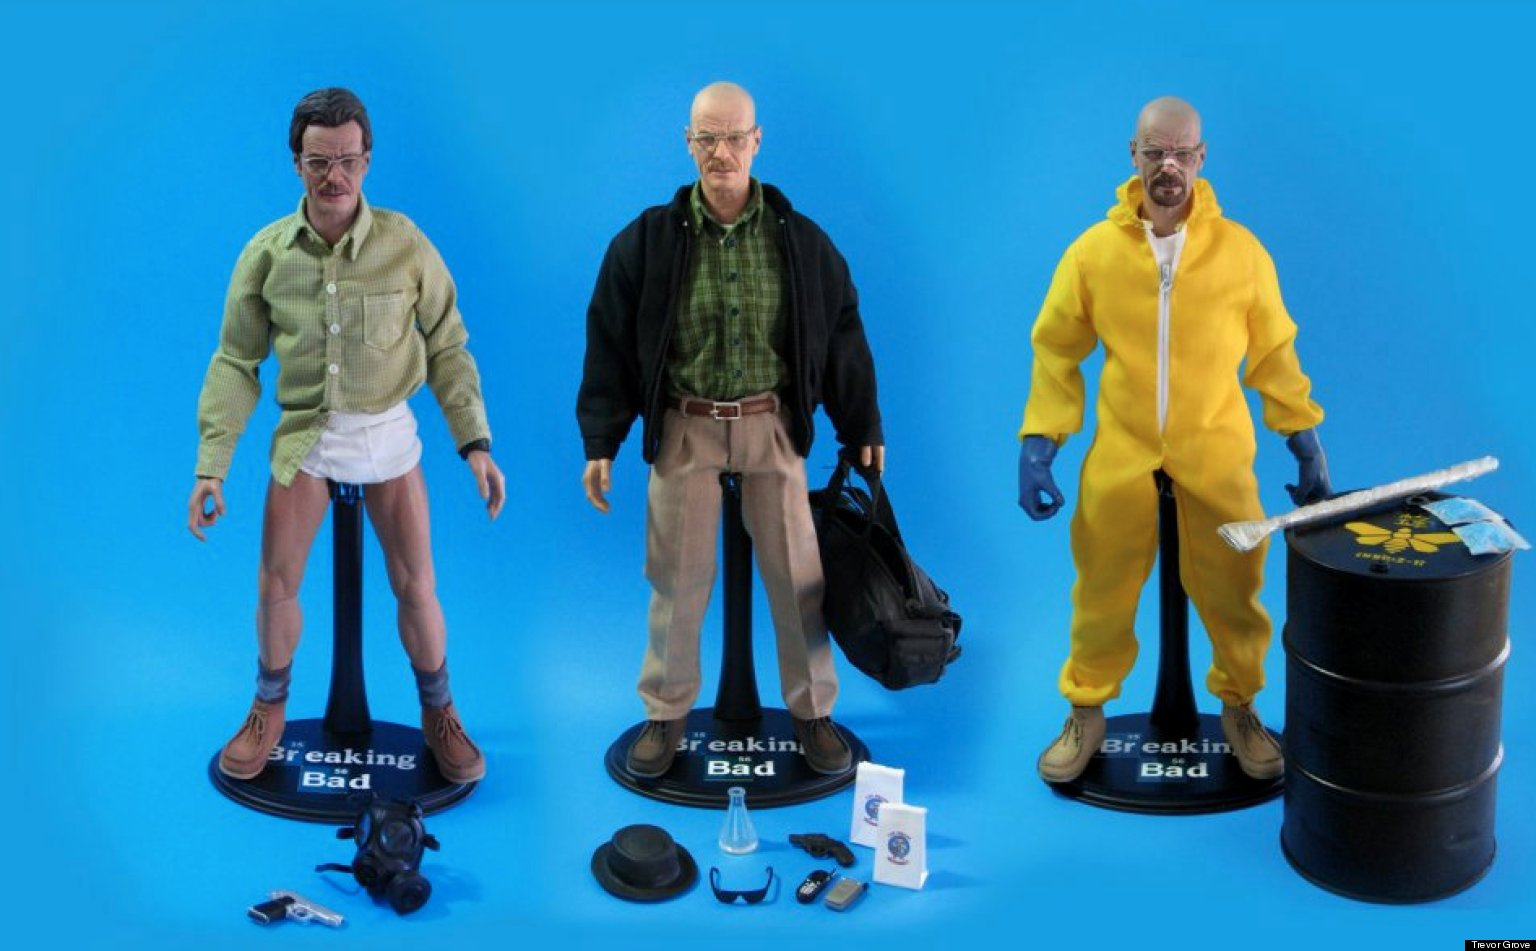 Toys For Poor : Breaking bad action figures sculptor trevor grove gives